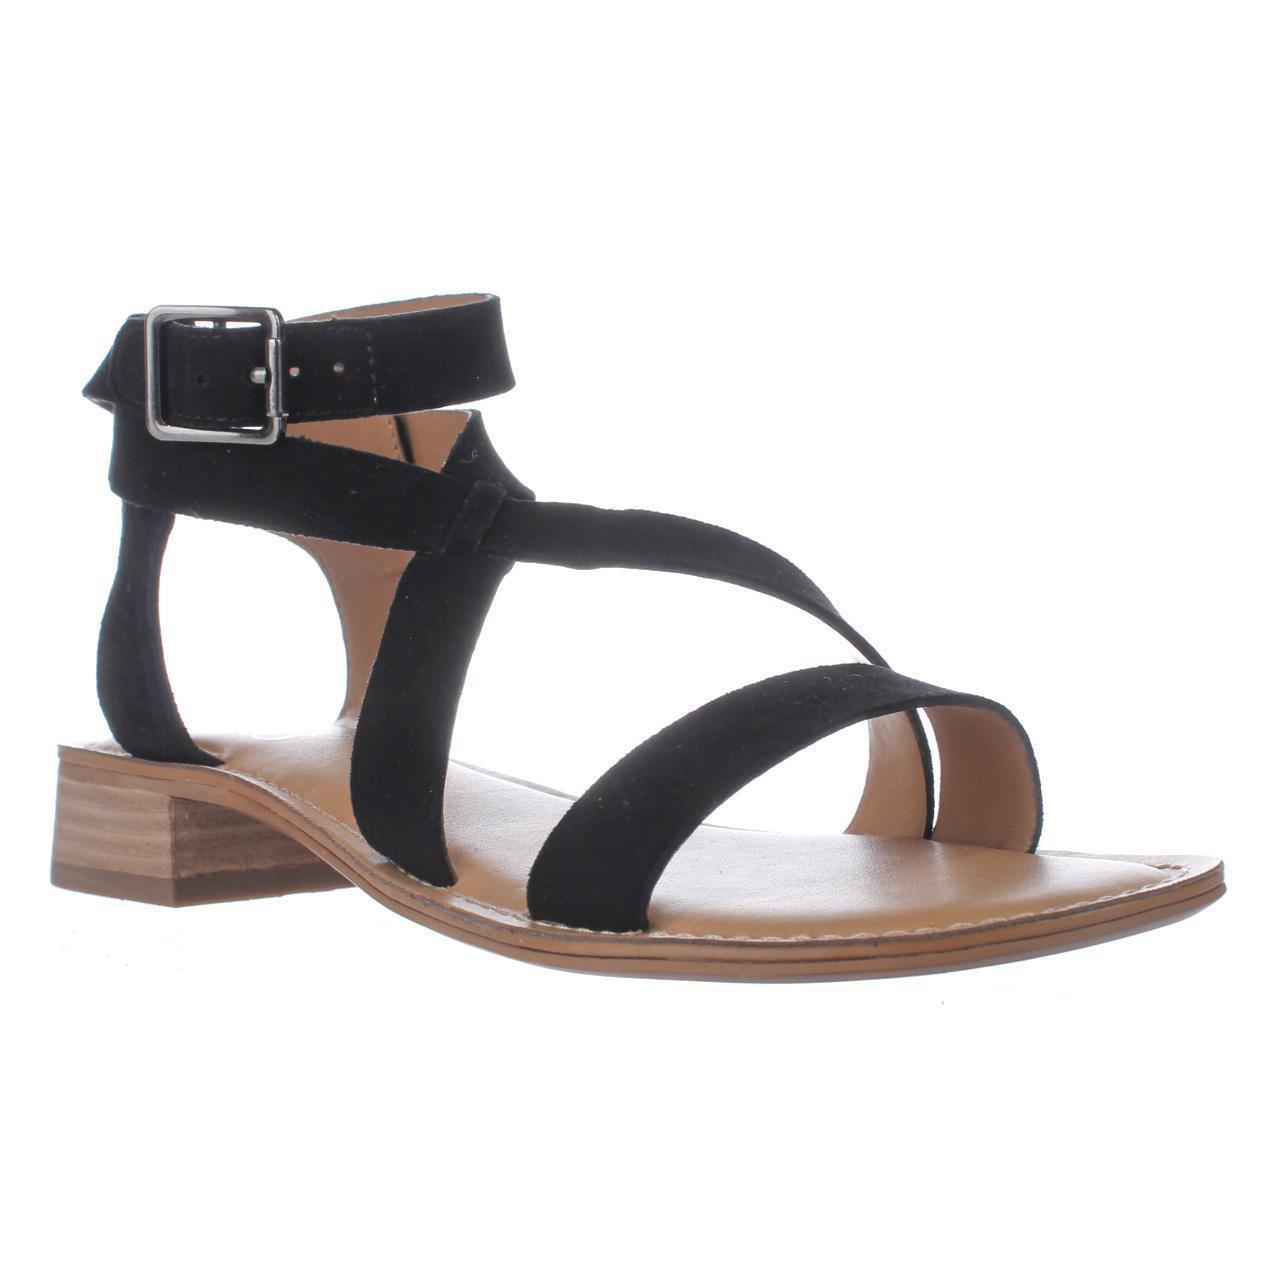 2161735c5a1b Franco Sarto Alora Flat Cross Strap Sandals in Black - Lyst